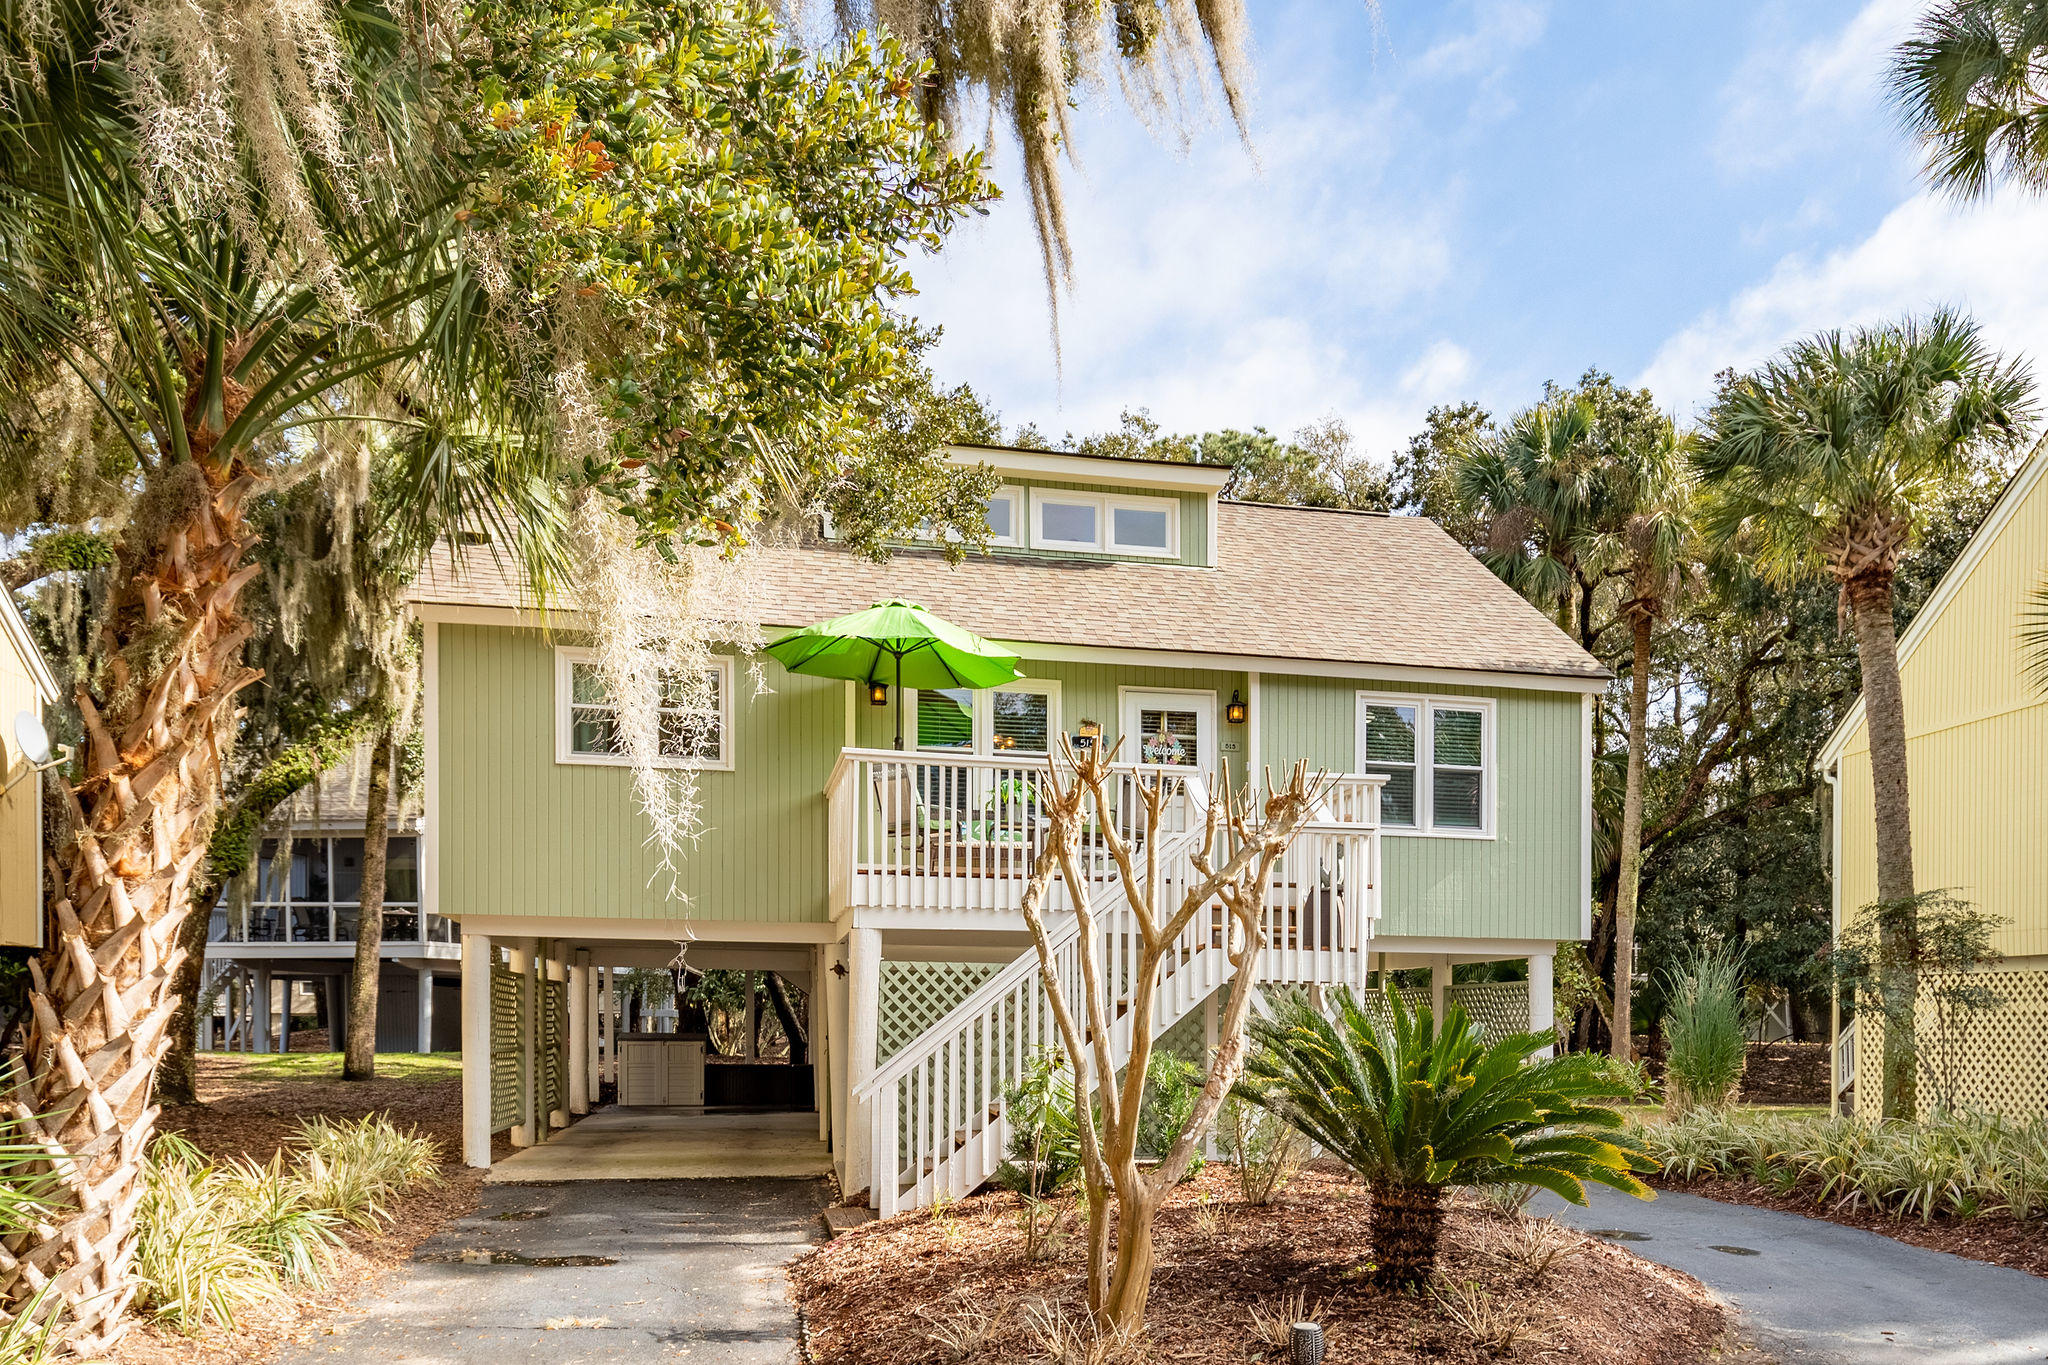 Seabrook Island Homes For Sale - 515 Cobby Creek, Seabrook Island, SC - 45